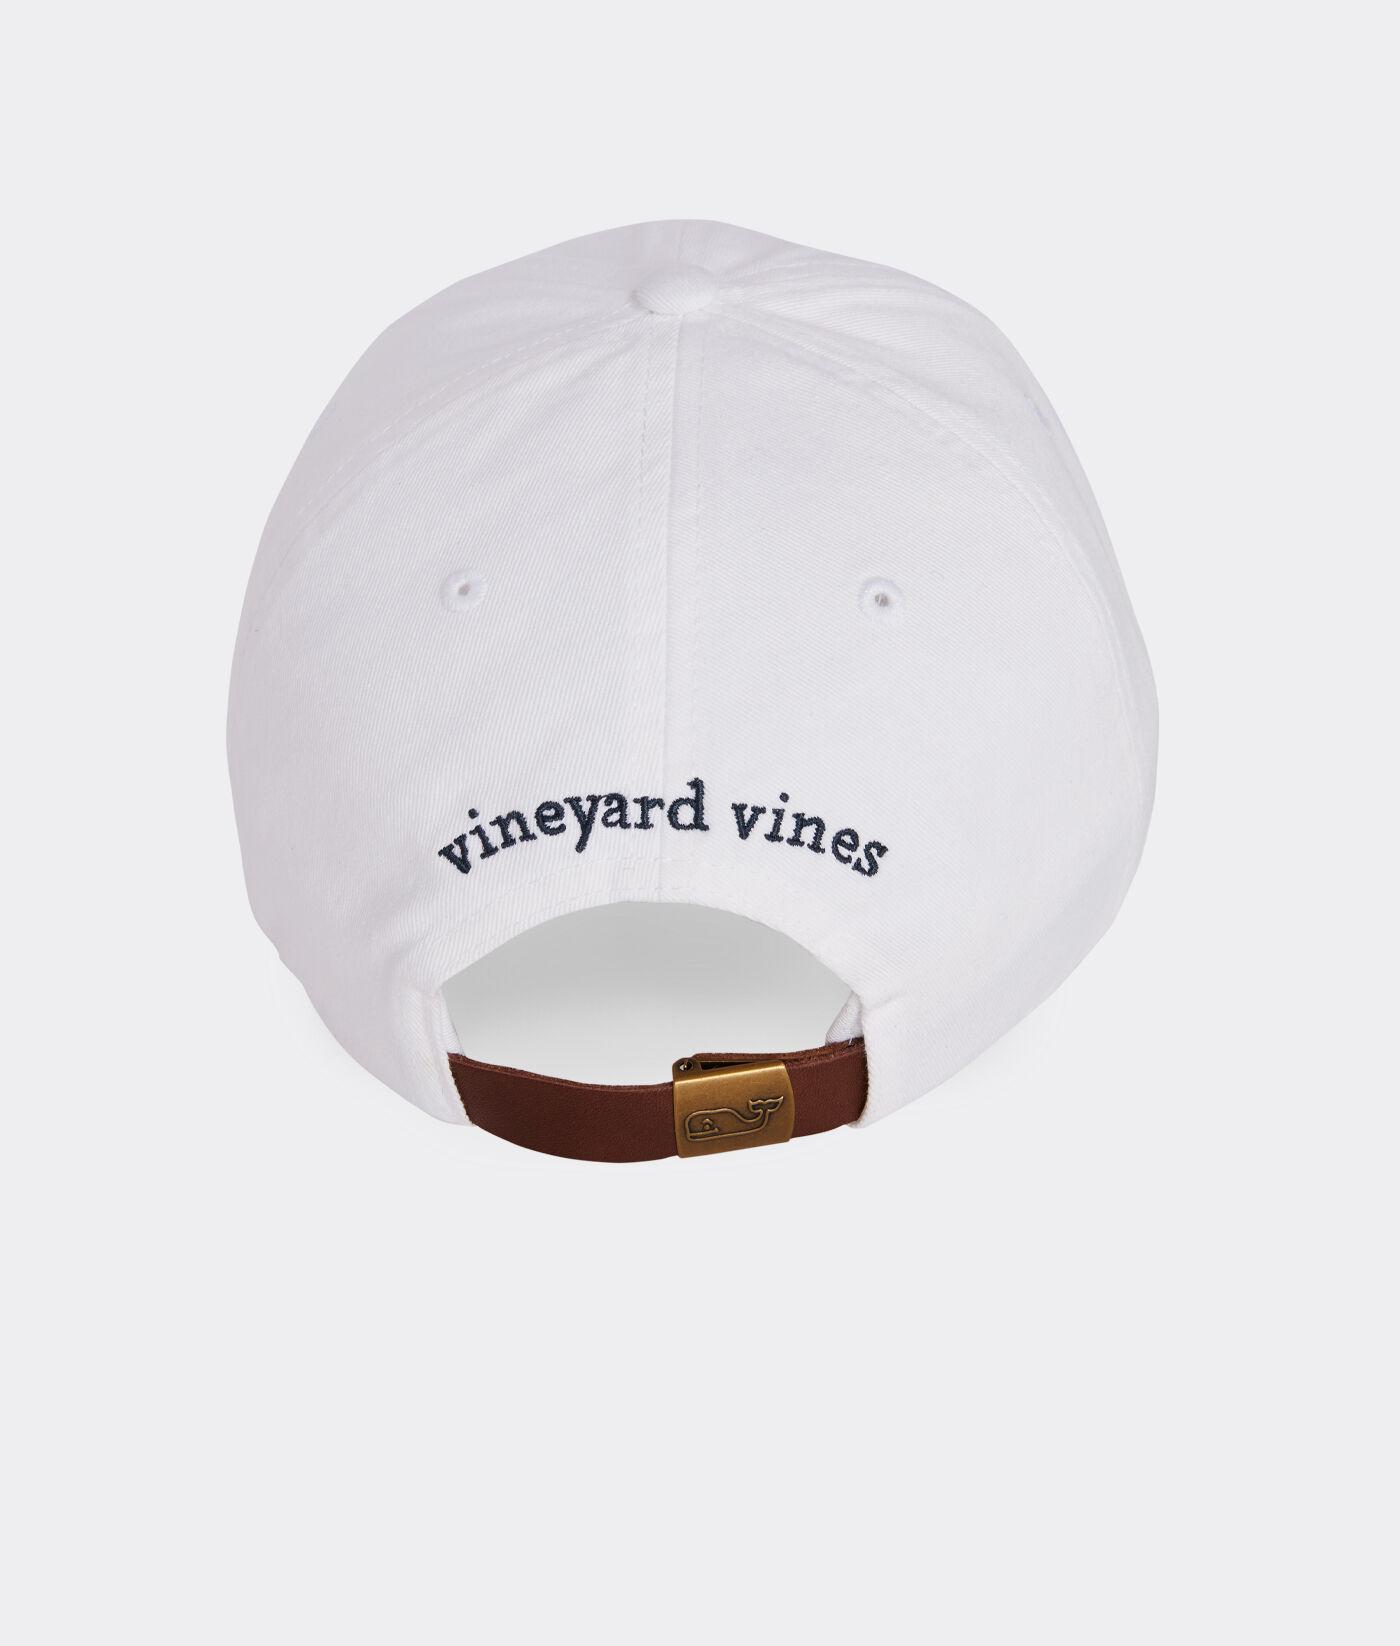 Make Me Do Stuff Baseball Caps Adjustable Back Strap Flat Hat